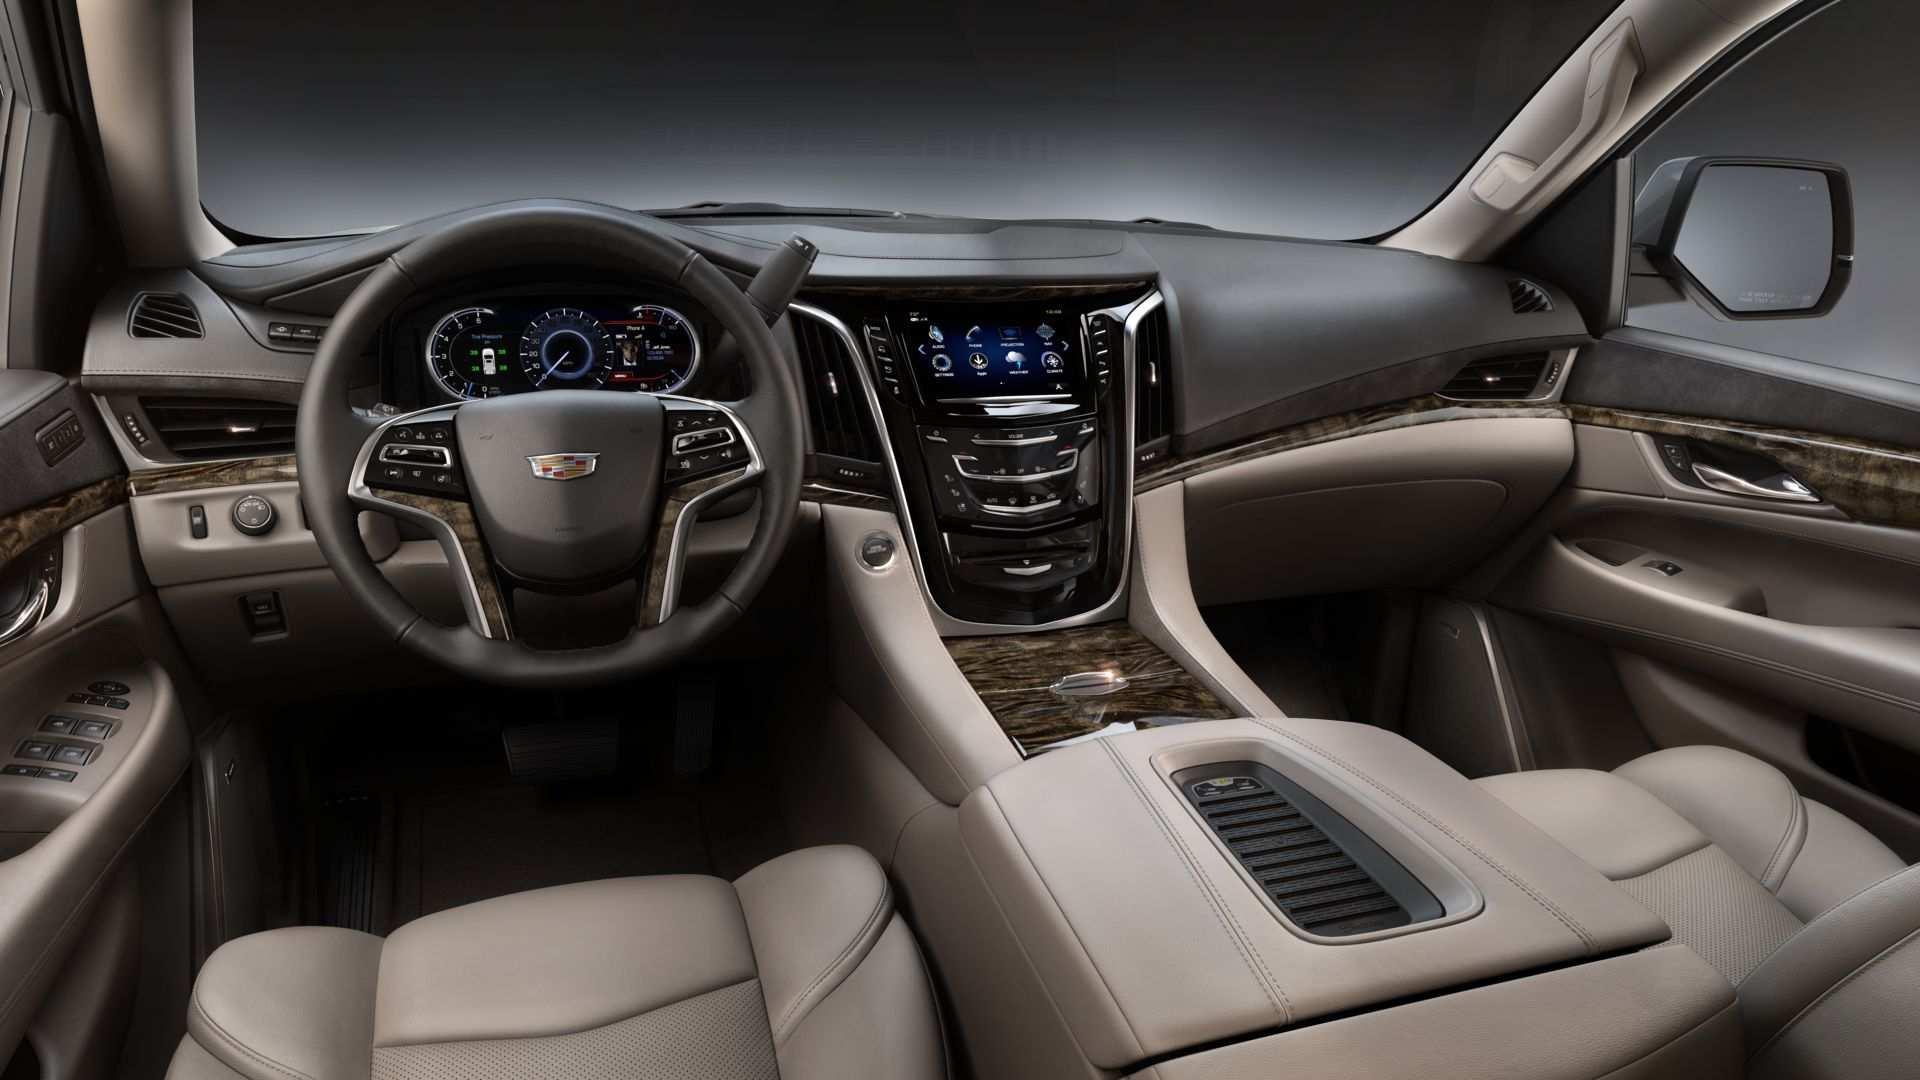 37 All New 2019 Cadillac Interior Spy Shoot for 2019 Cadillac Interior